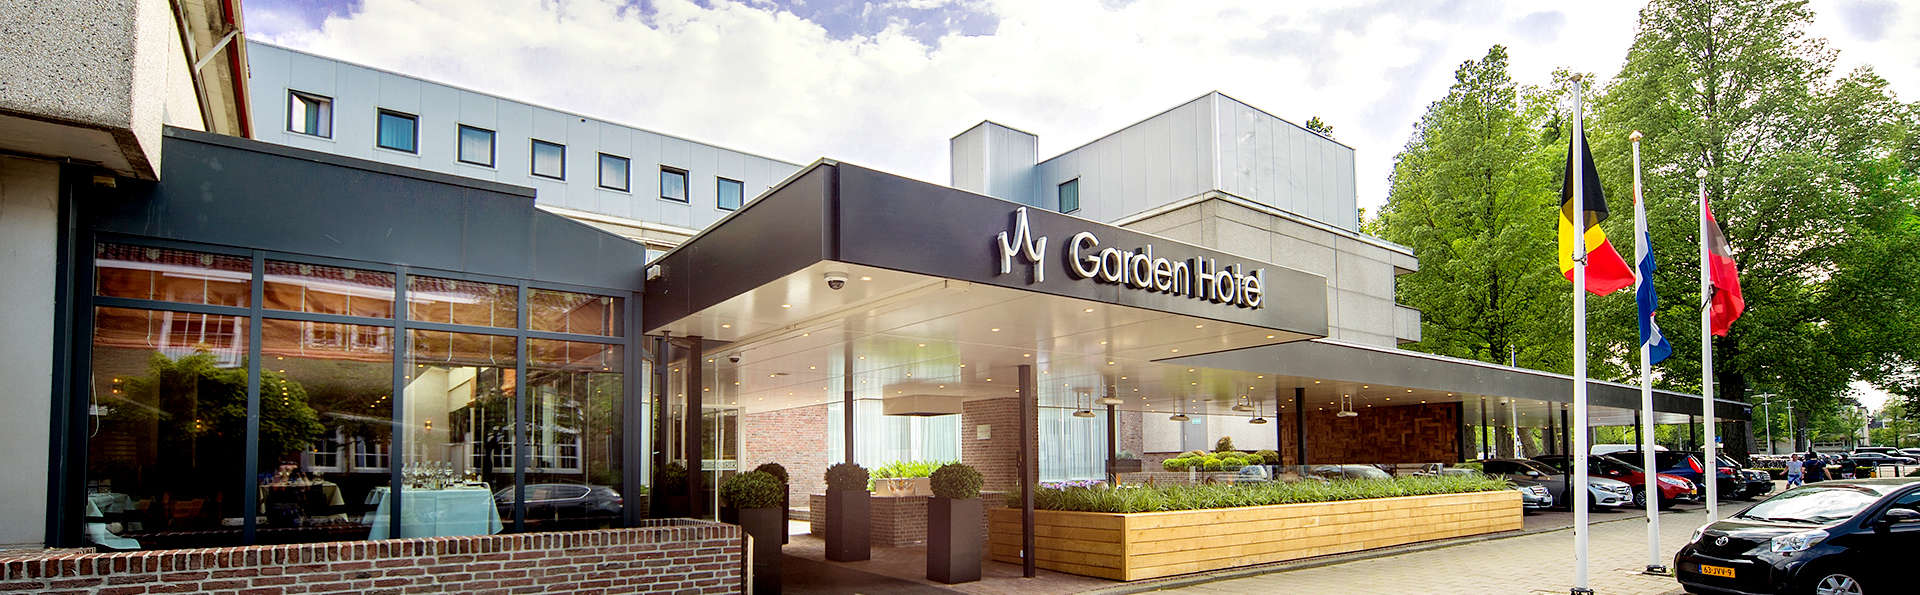 Bilderberg Garden Hotel - EDIT_NEW_FRONT.jpg